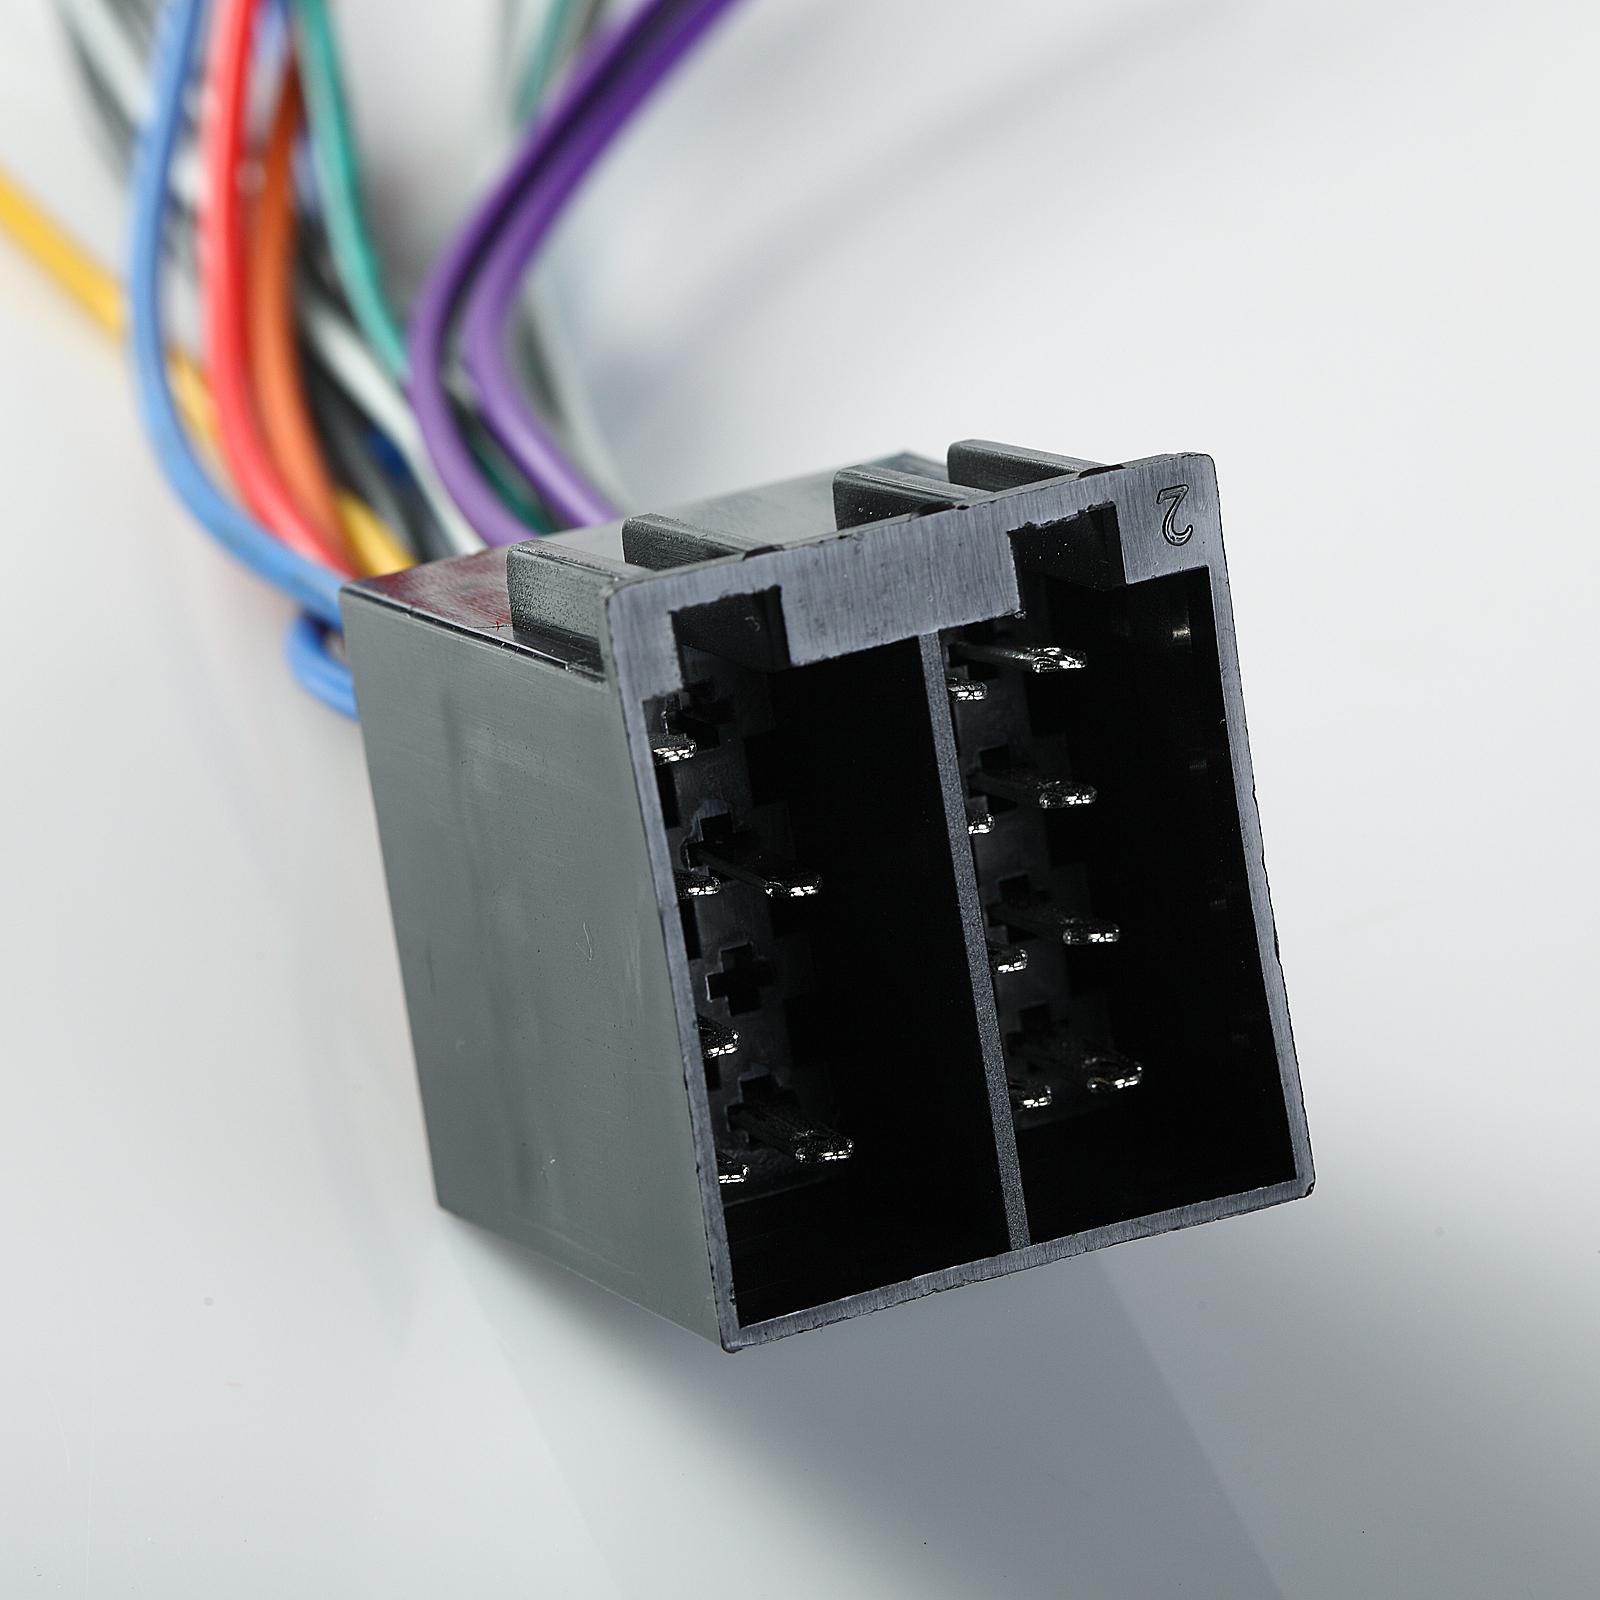 Dodge Ram Wiring Harness Raotor. . Wiring Diagram on